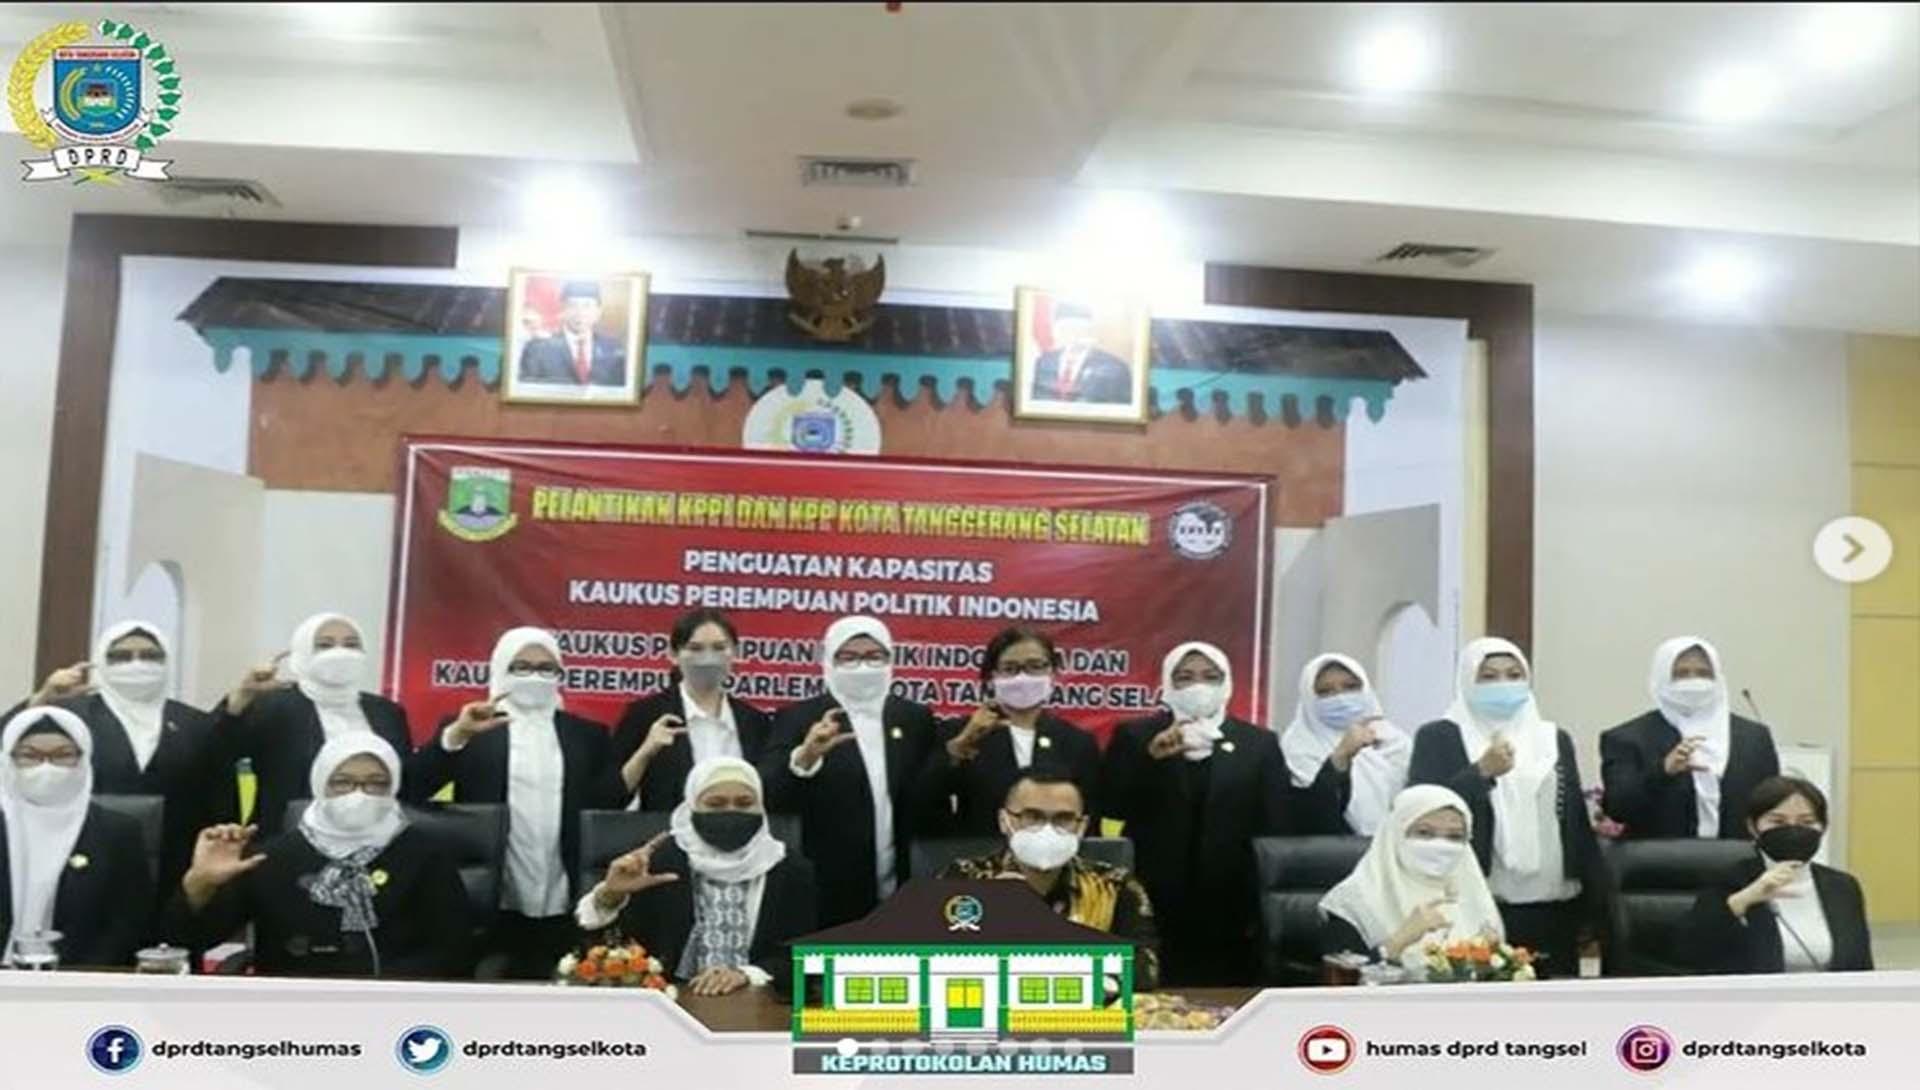 Pelantikan KPPI dan KPP Kota Tangerang Selatan Periode 2021 - 2026